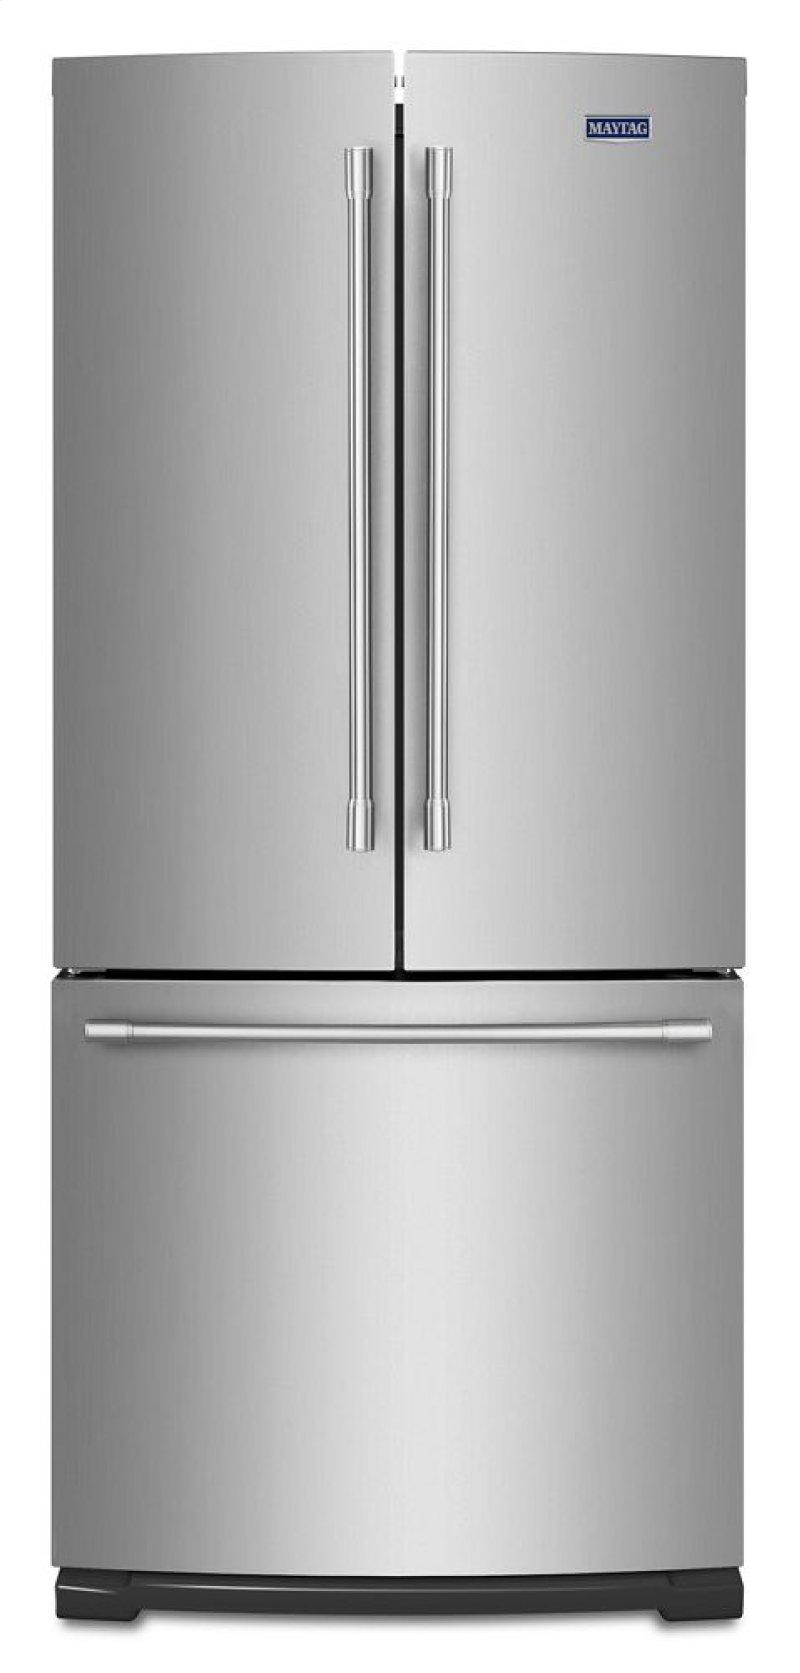 Bob wallace appliance huntsville alabama - 30 Inch Wide French Door Refrigerator 20 Cu Ft